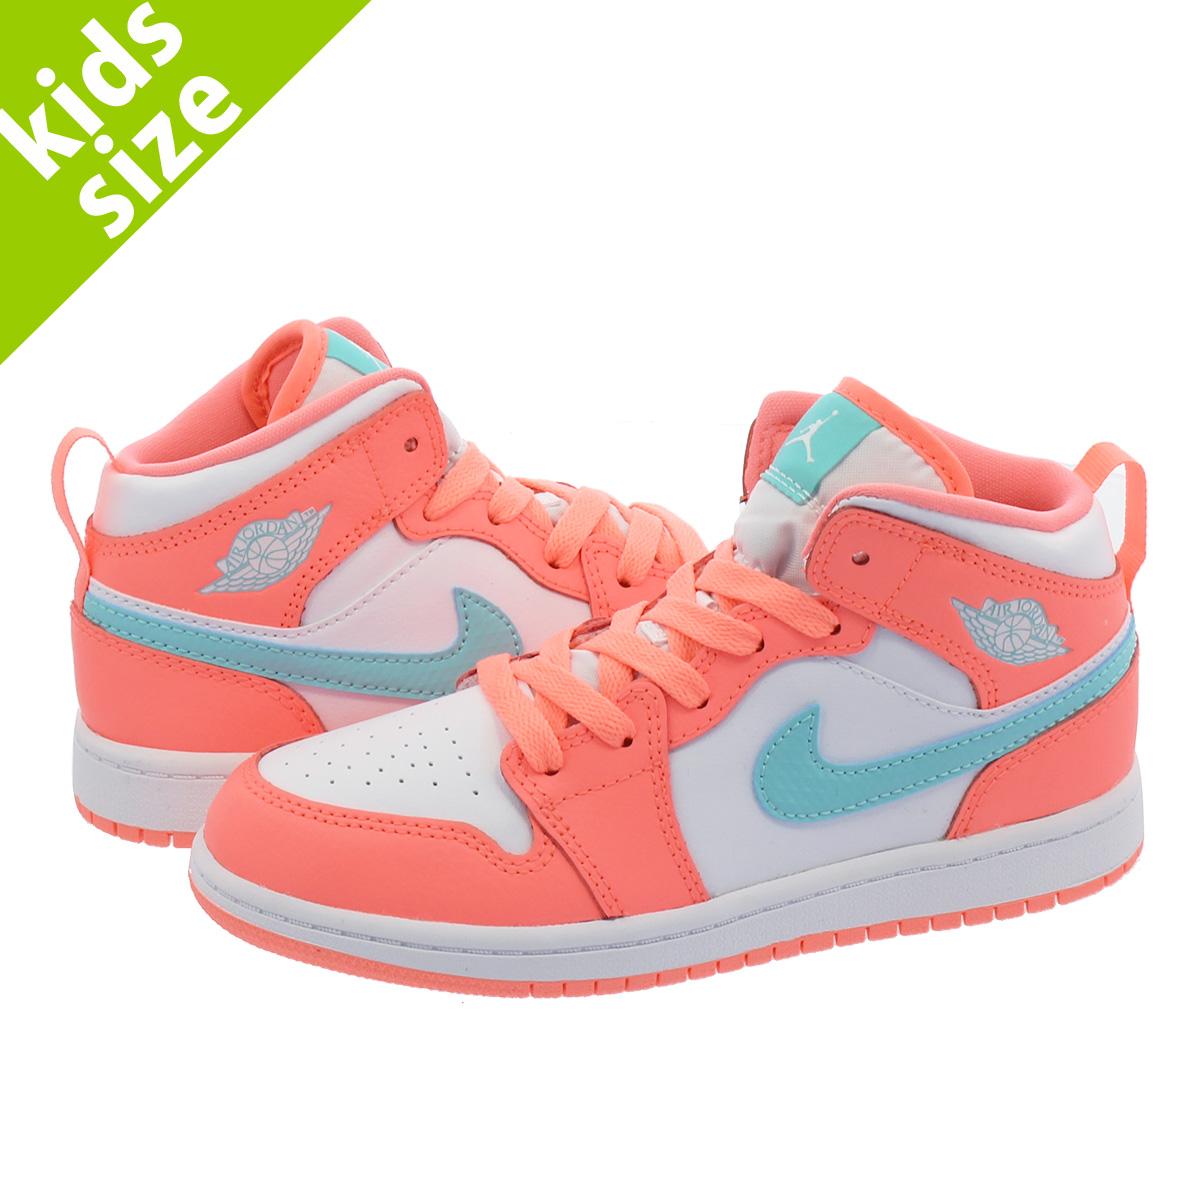 huge discount 9ce8a b2746 NIKE AIR JORDAN 1 MID PS Nike Air Jordan 1 mid PS CRIMSON PINK/PULSE GREEN  640,737-814